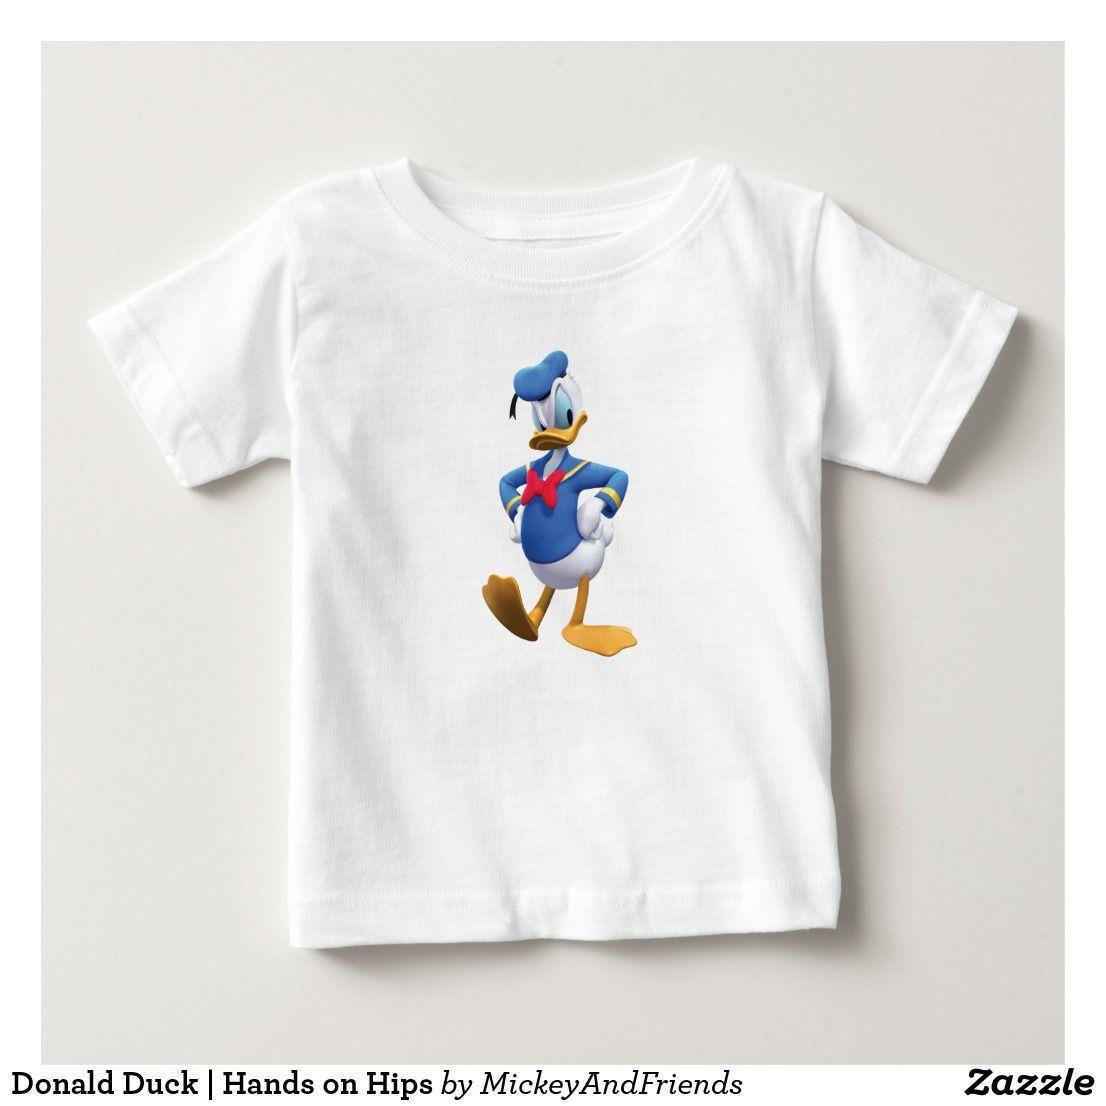 Daisy Duck Disneybounding Shirt XS Daisy Disney Shirt Daisy Duck Halloween Shirt XL Girls Daisy Duck Costume Shirt Disney Womens Daisy